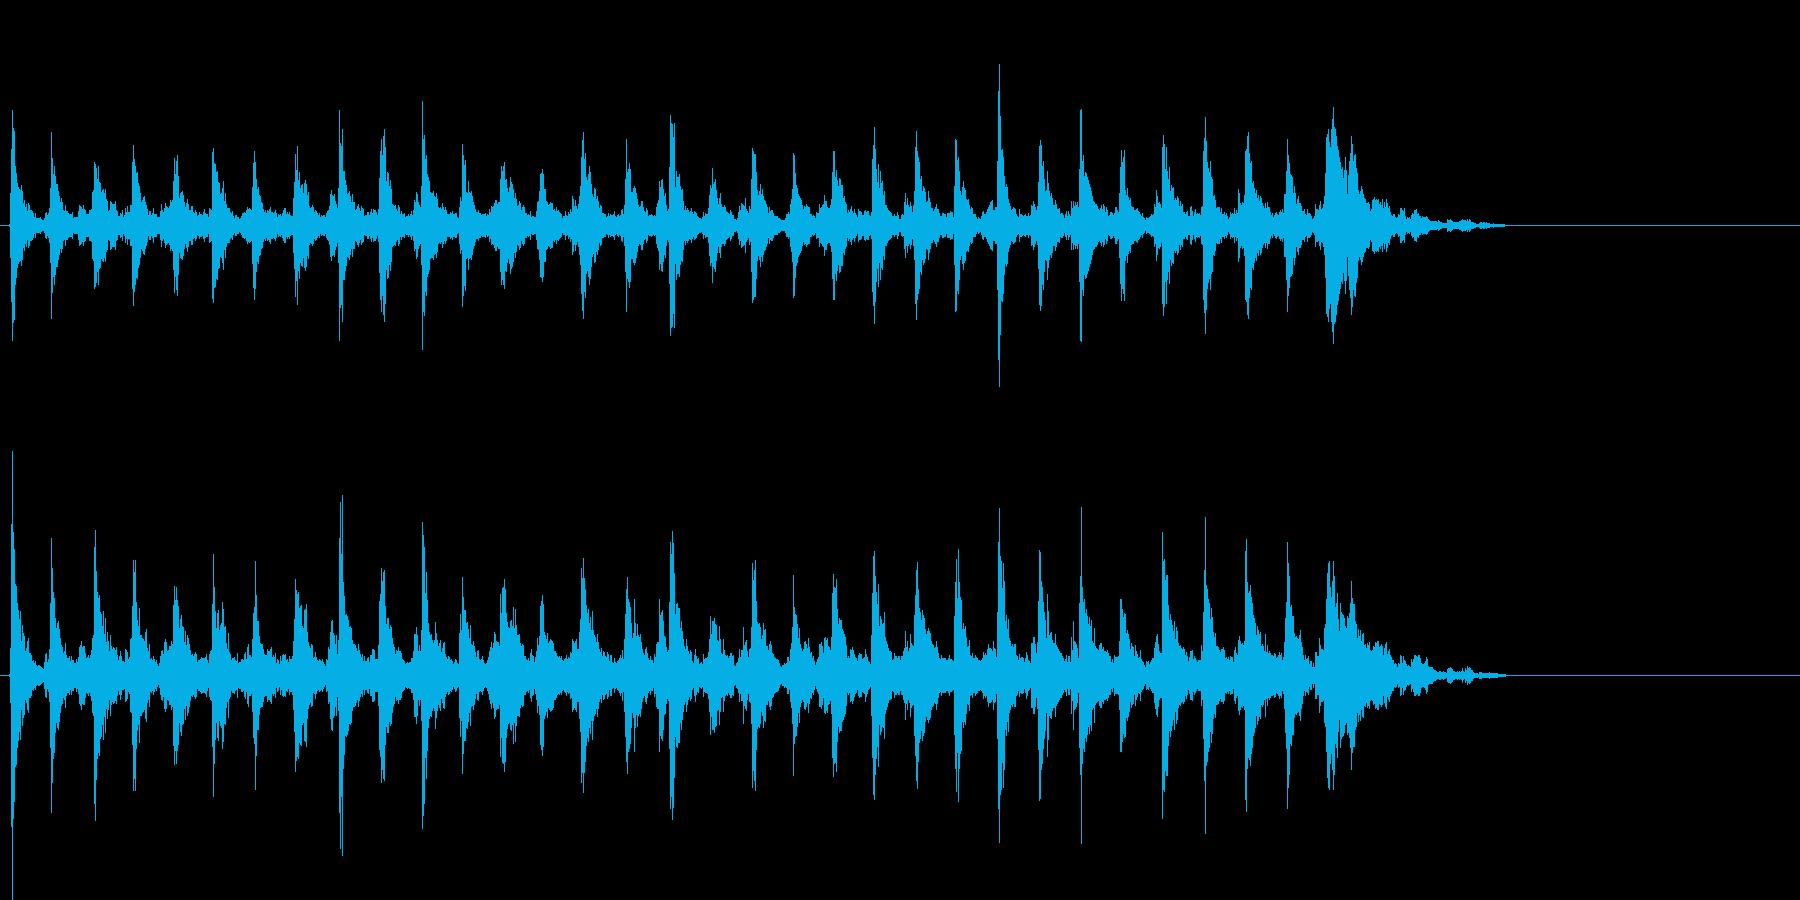 Xmasに最適トナカイベルのループ音02の再生済みの波形